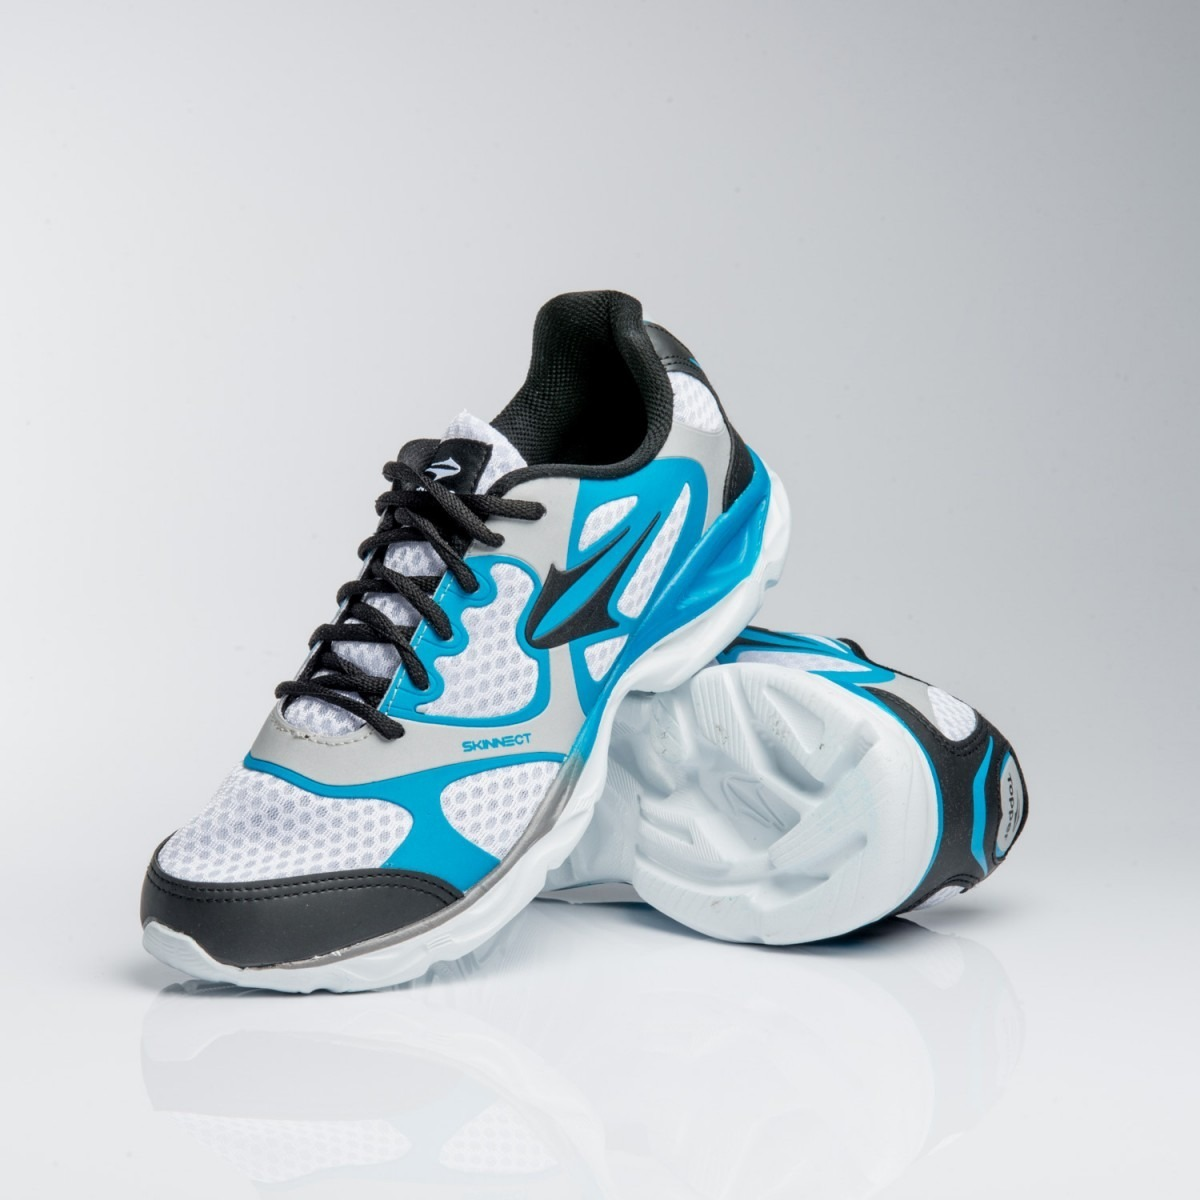 ad6ce6062fa zapatillas topper volt para hombre 29241 cbl. Cargando zoom.